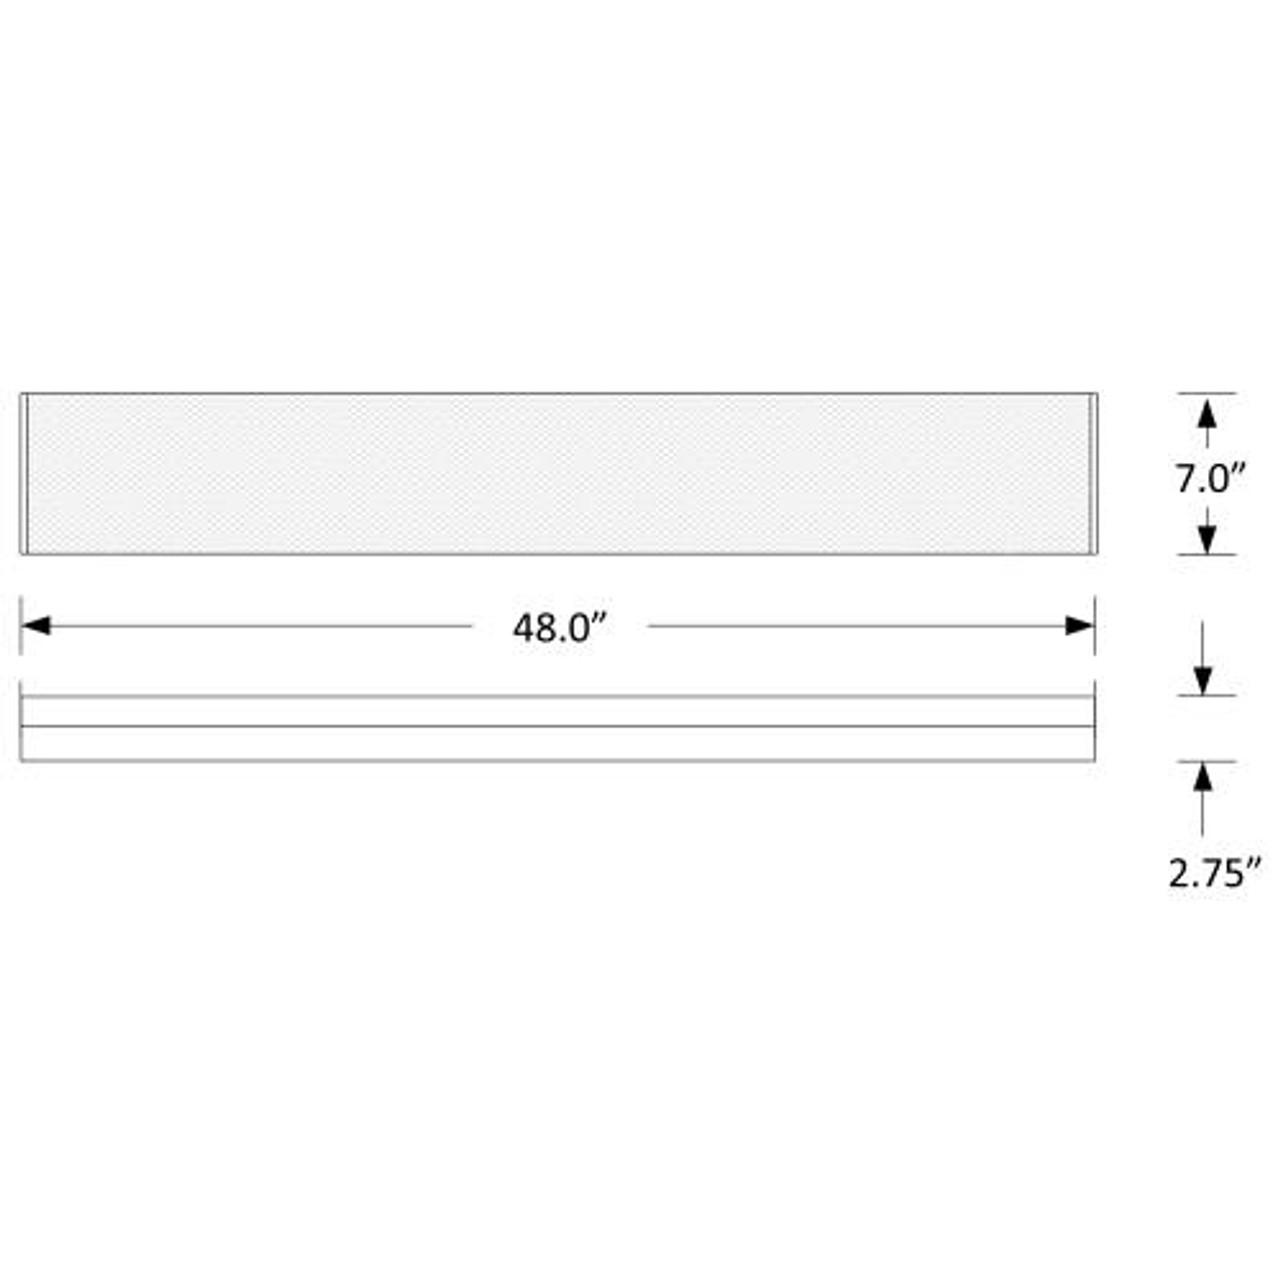 LED Wrap Around 4ft, 40 watt, 5240 lumens, 120-277V, DIM, UL and DLC Listed